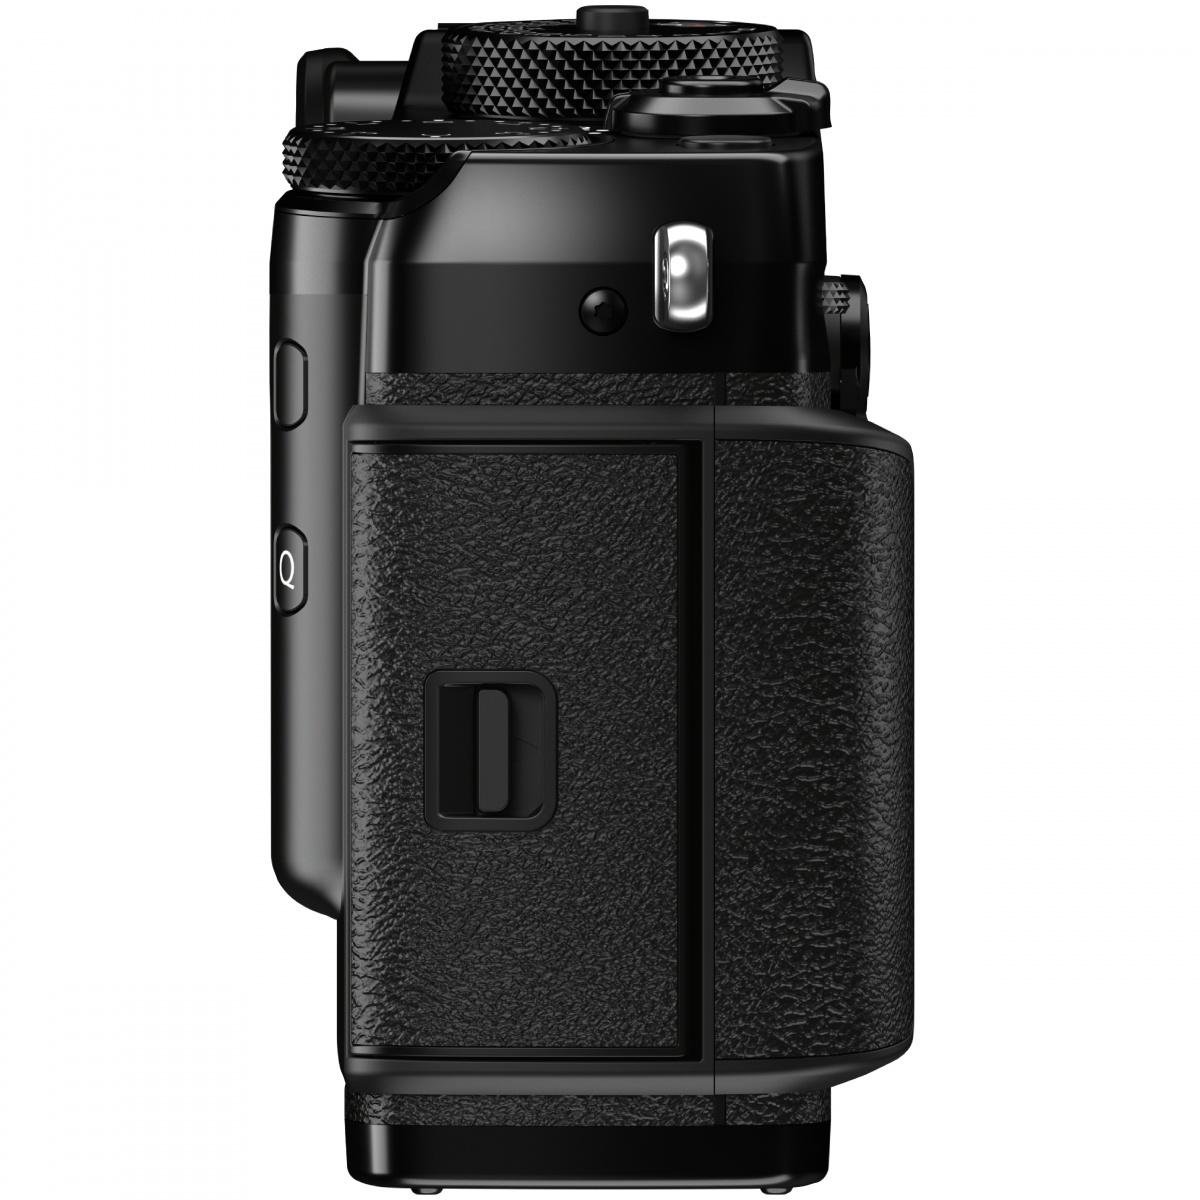 Fujifilm X-Pro3 Gehäuse Schwarz